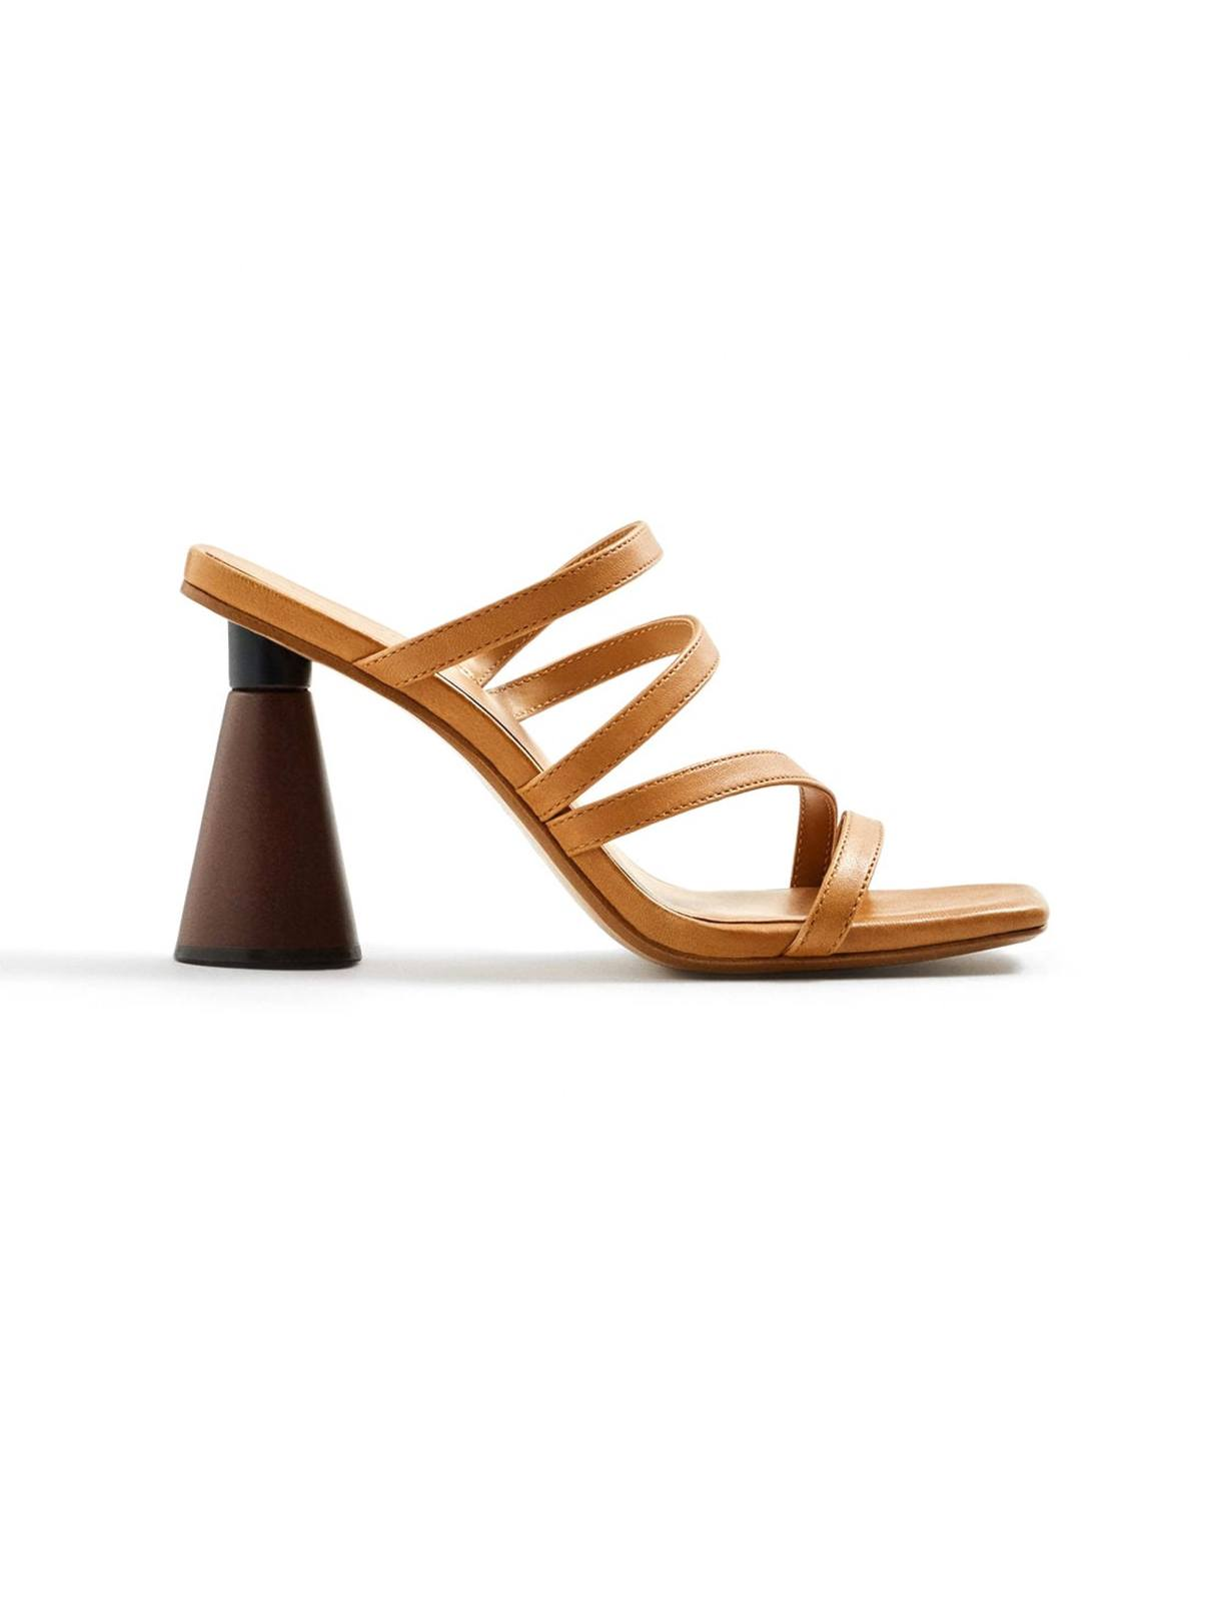 کفش چرم پاشنه بلند زنانه – مانگو  Women Leather High Heel Shoes – Mango